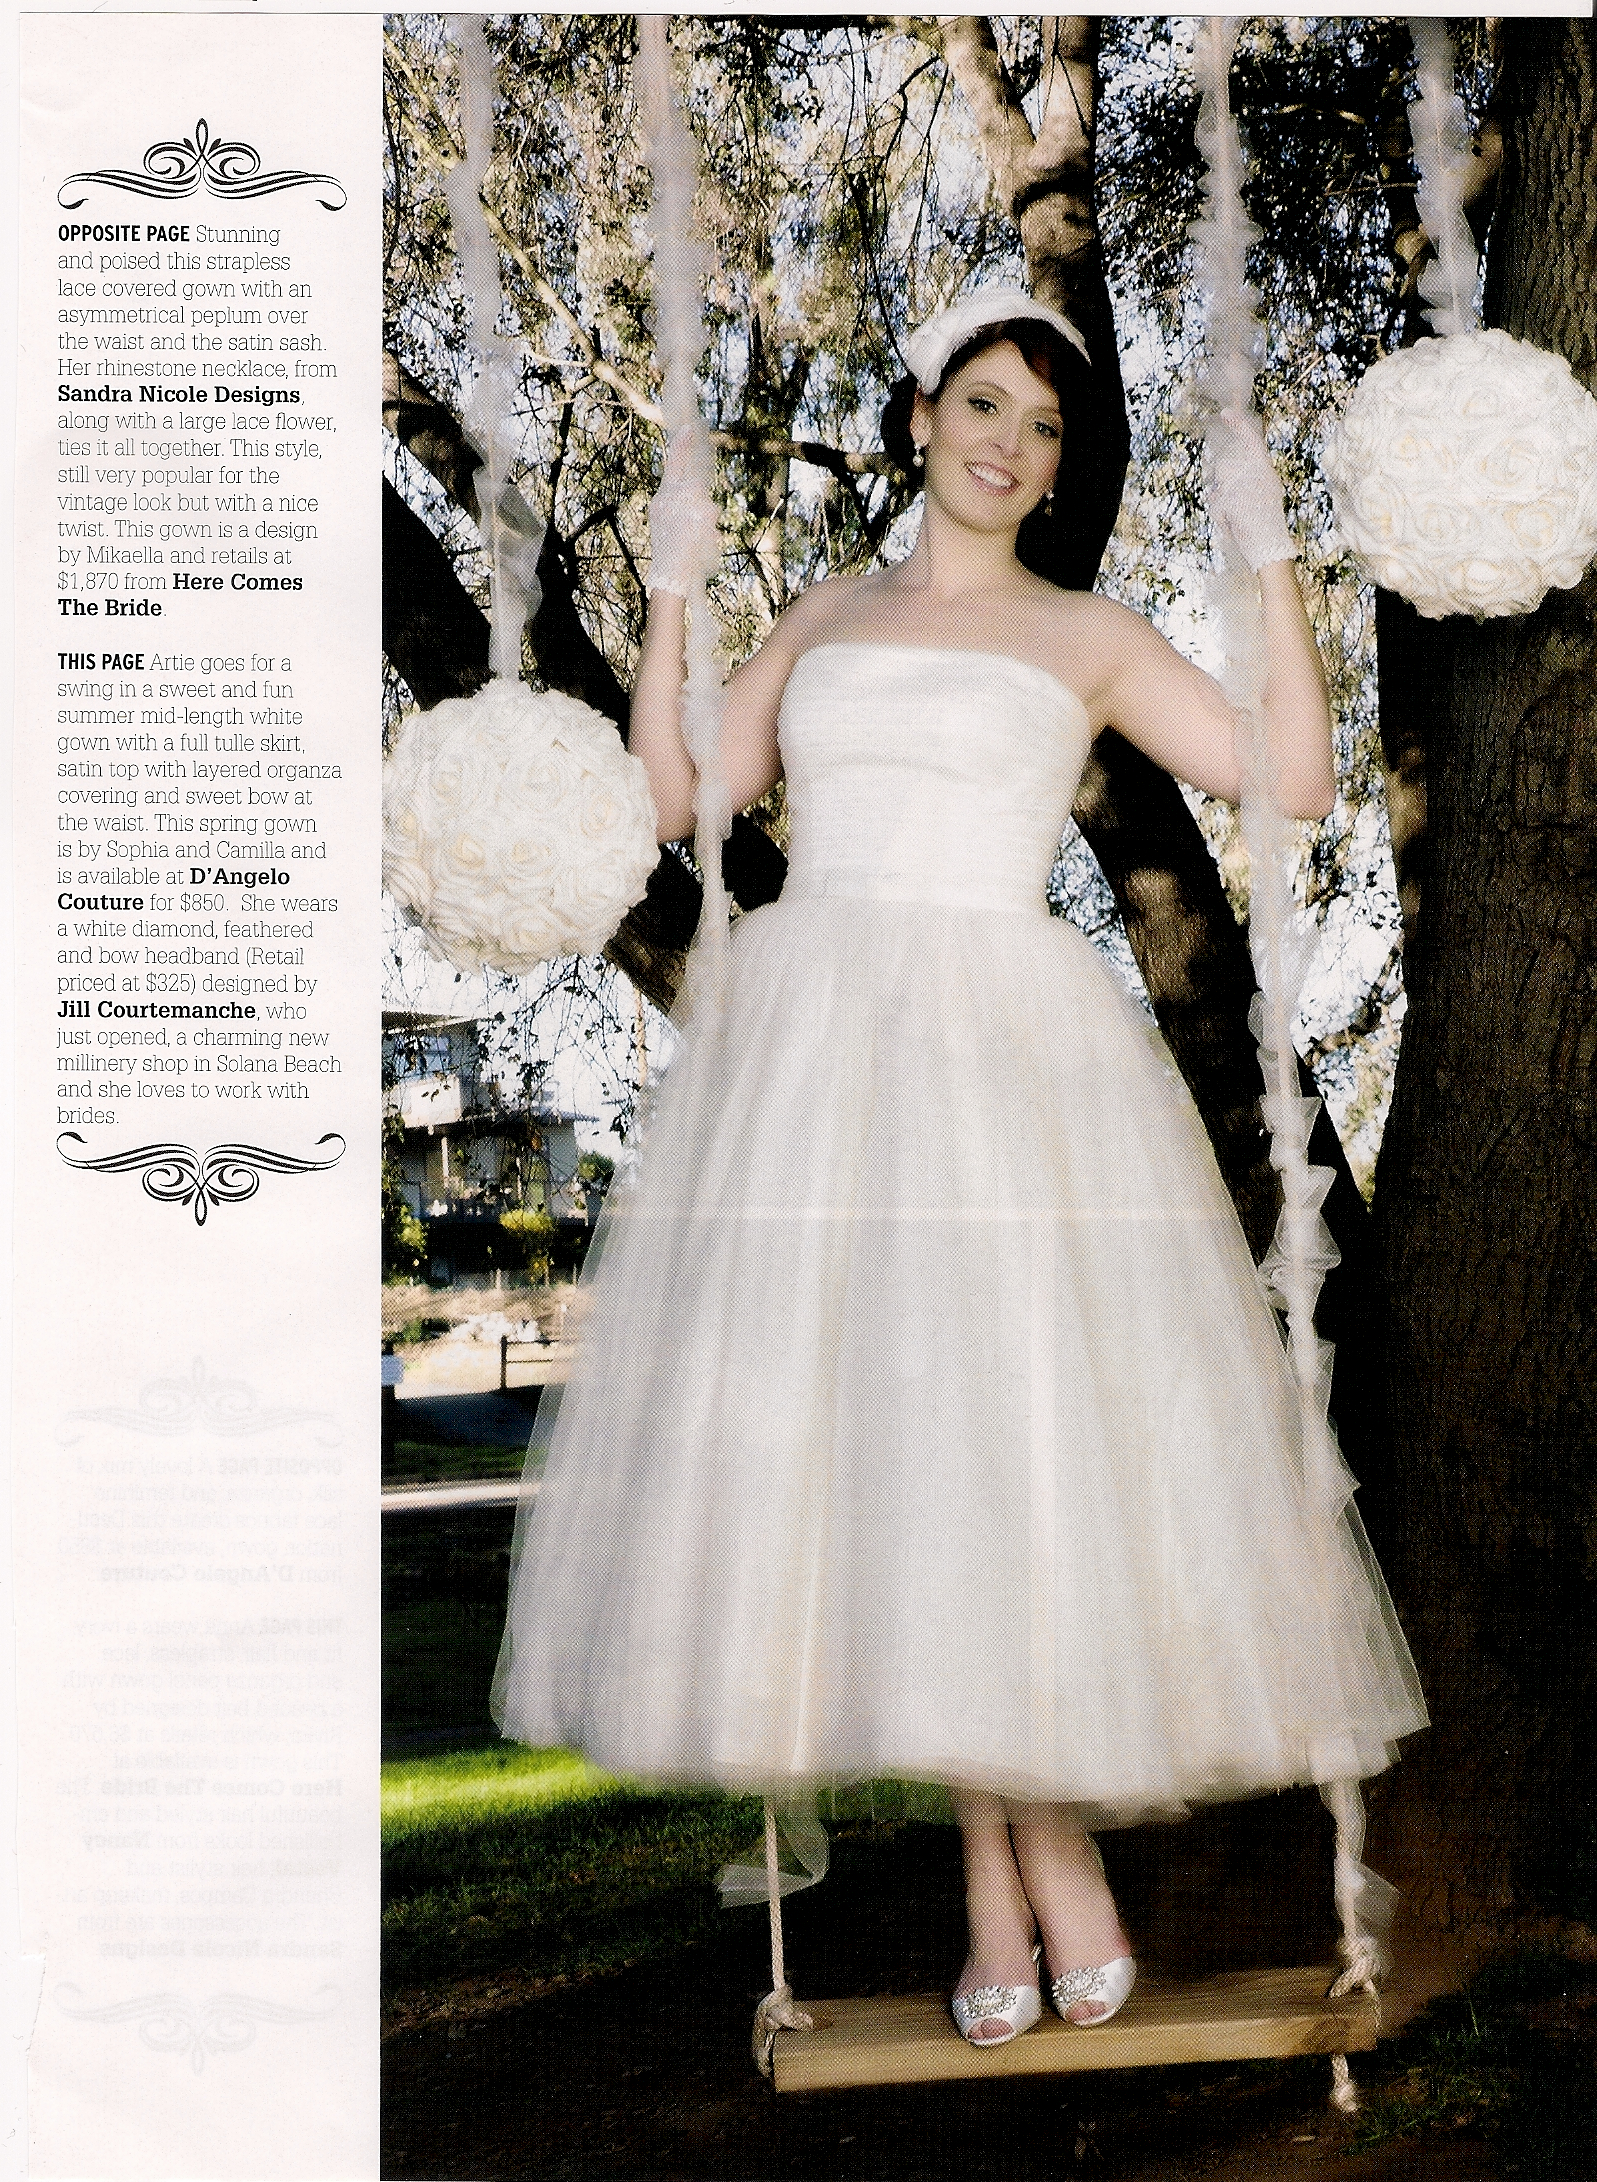 San Diego Style Weddings / May 2013